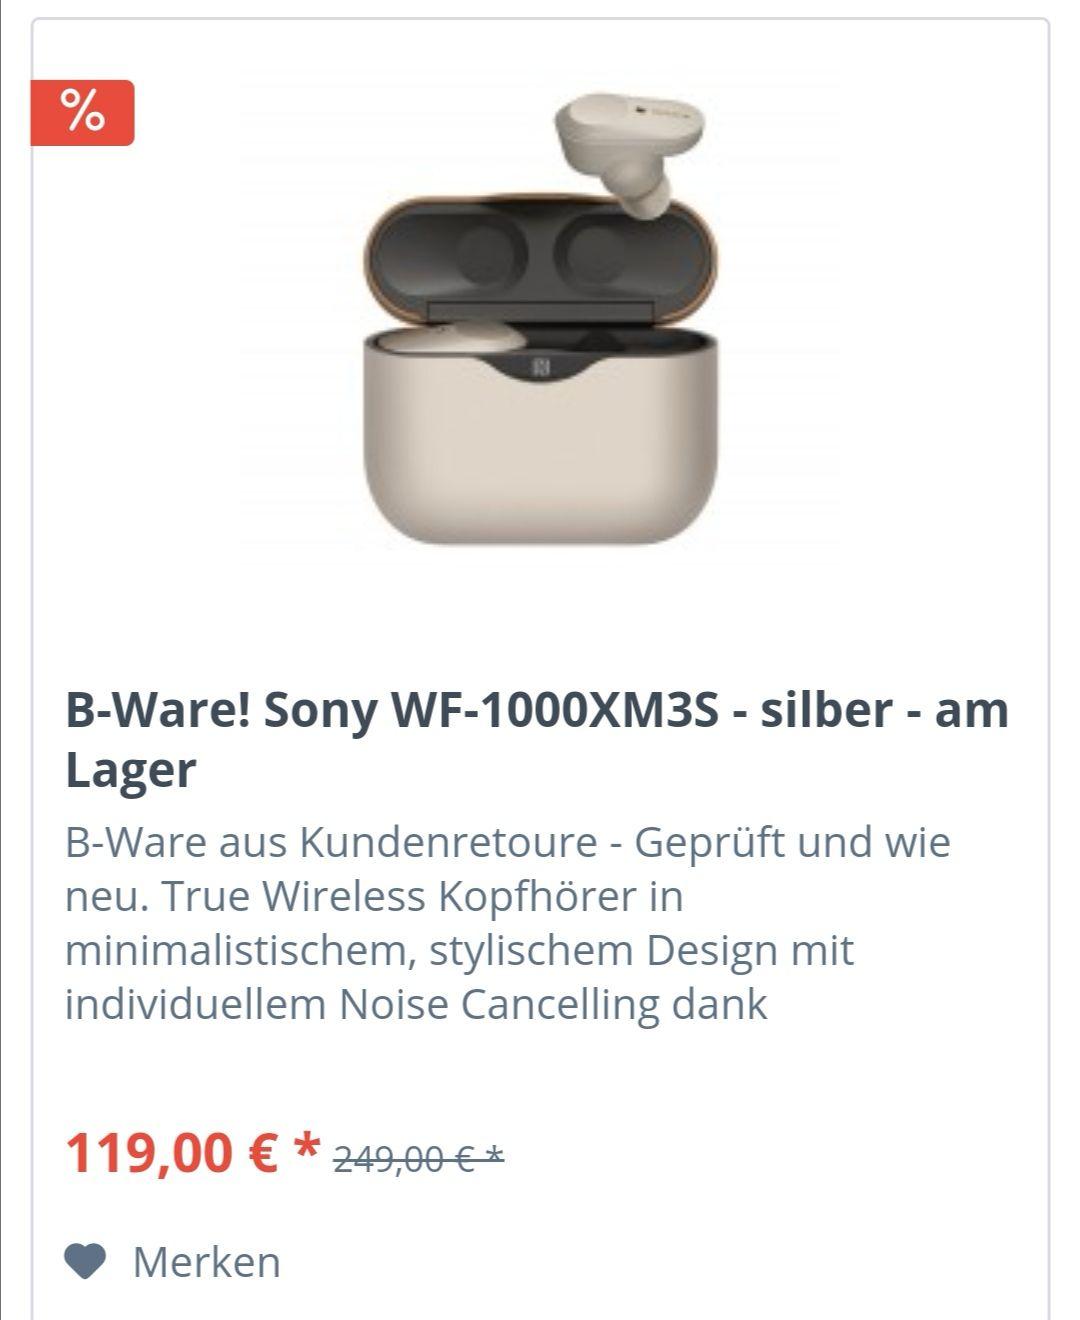 [CB Angebot] Sony WF-1000XM3 Wireless Kopfhörer mit Noise Cancelling B-Ware